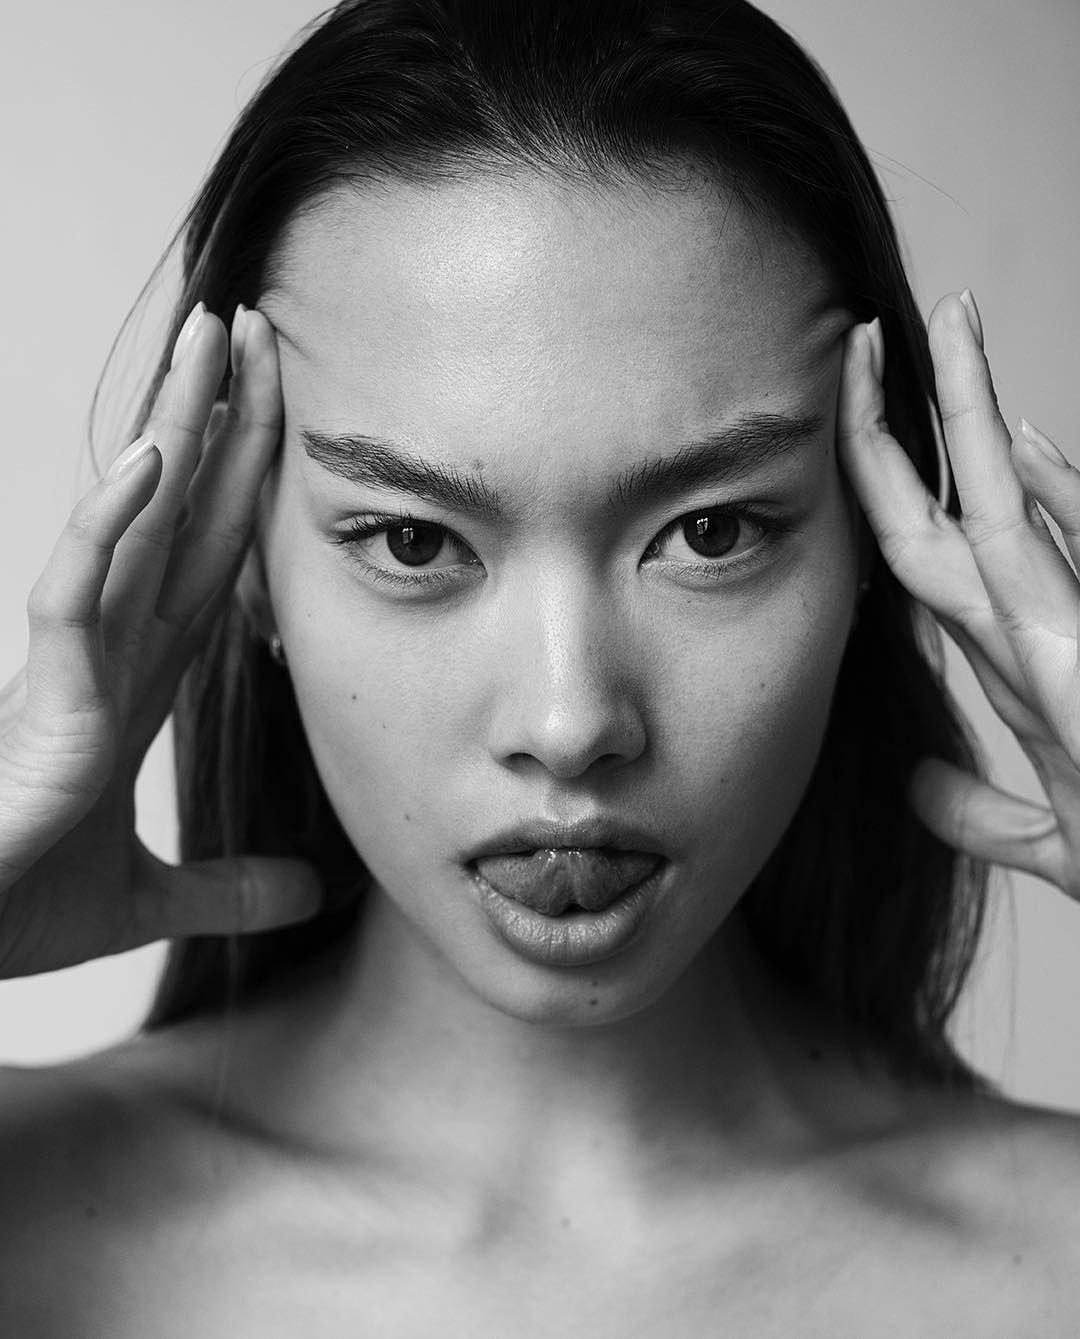 beautiful_black_and_white_portrait_photography_18.jpg